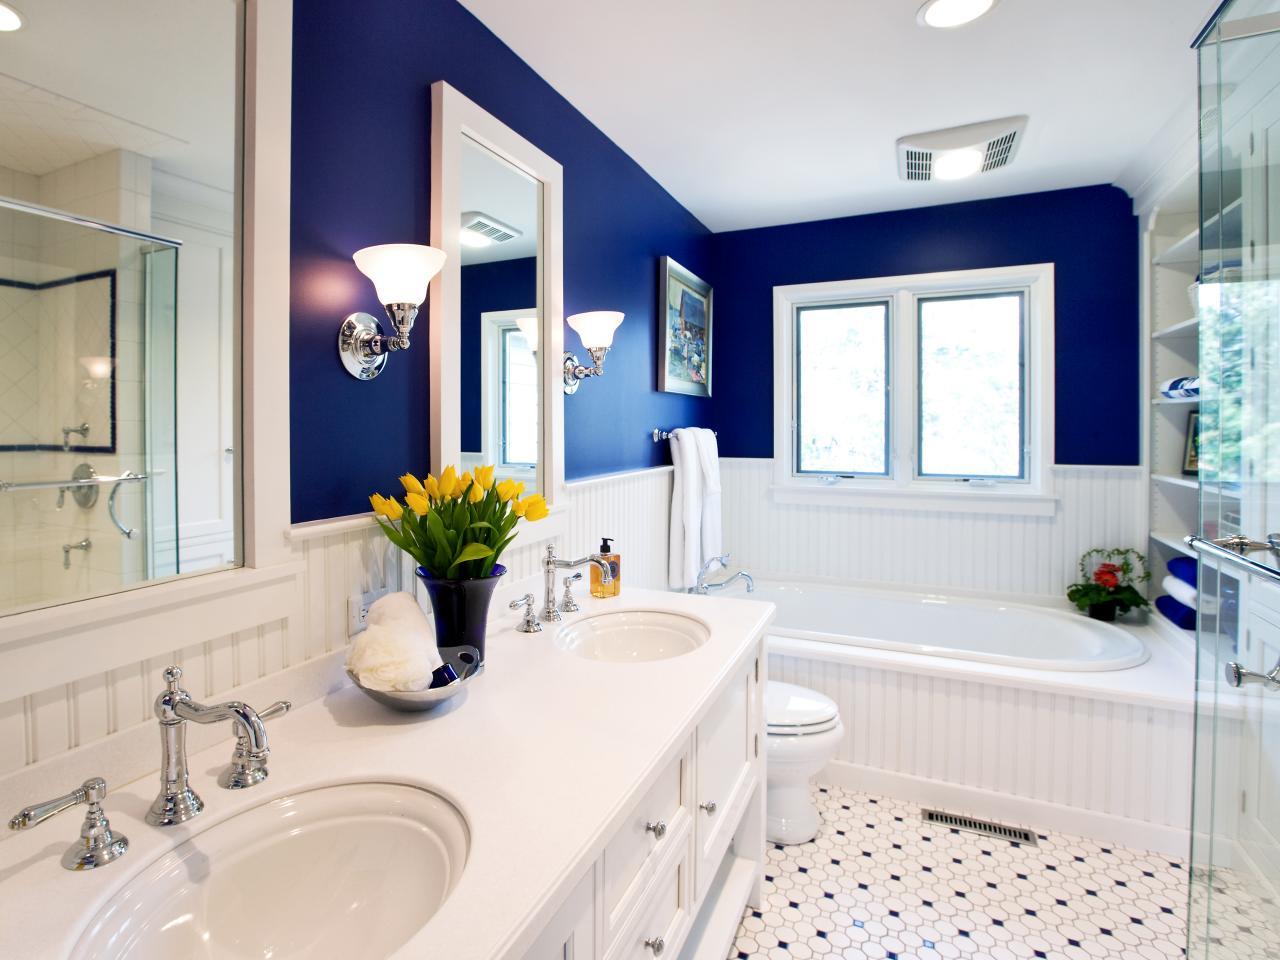 gail-drury-blue-bathtub.jpg.rend.hgtvcom.1280.960